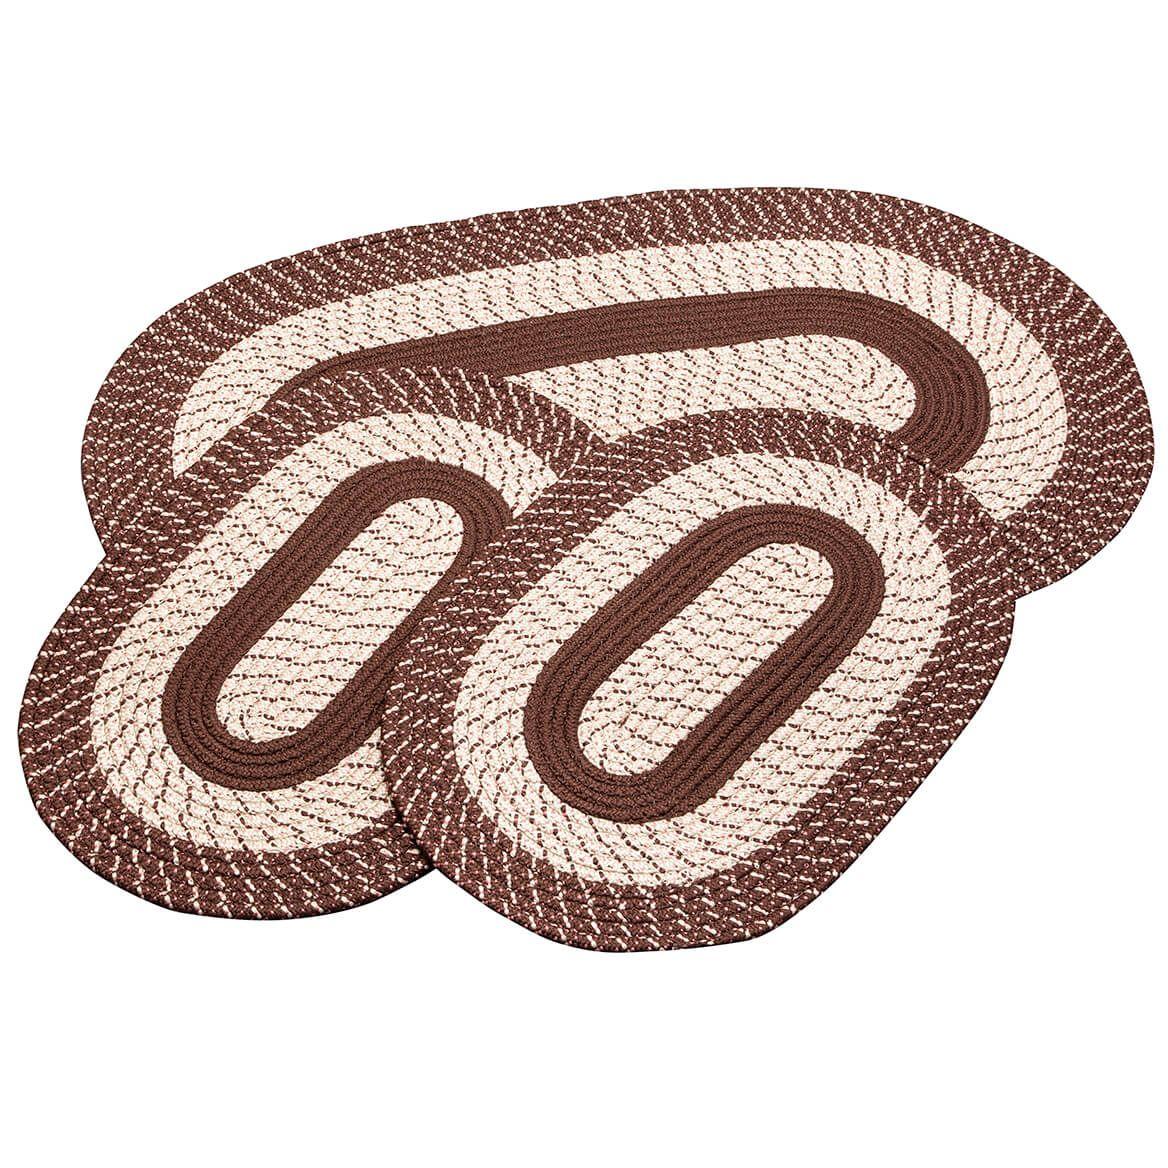 Chocolate 3-Piece Two-Tone Braided Rug Set by OakRidge™-367534